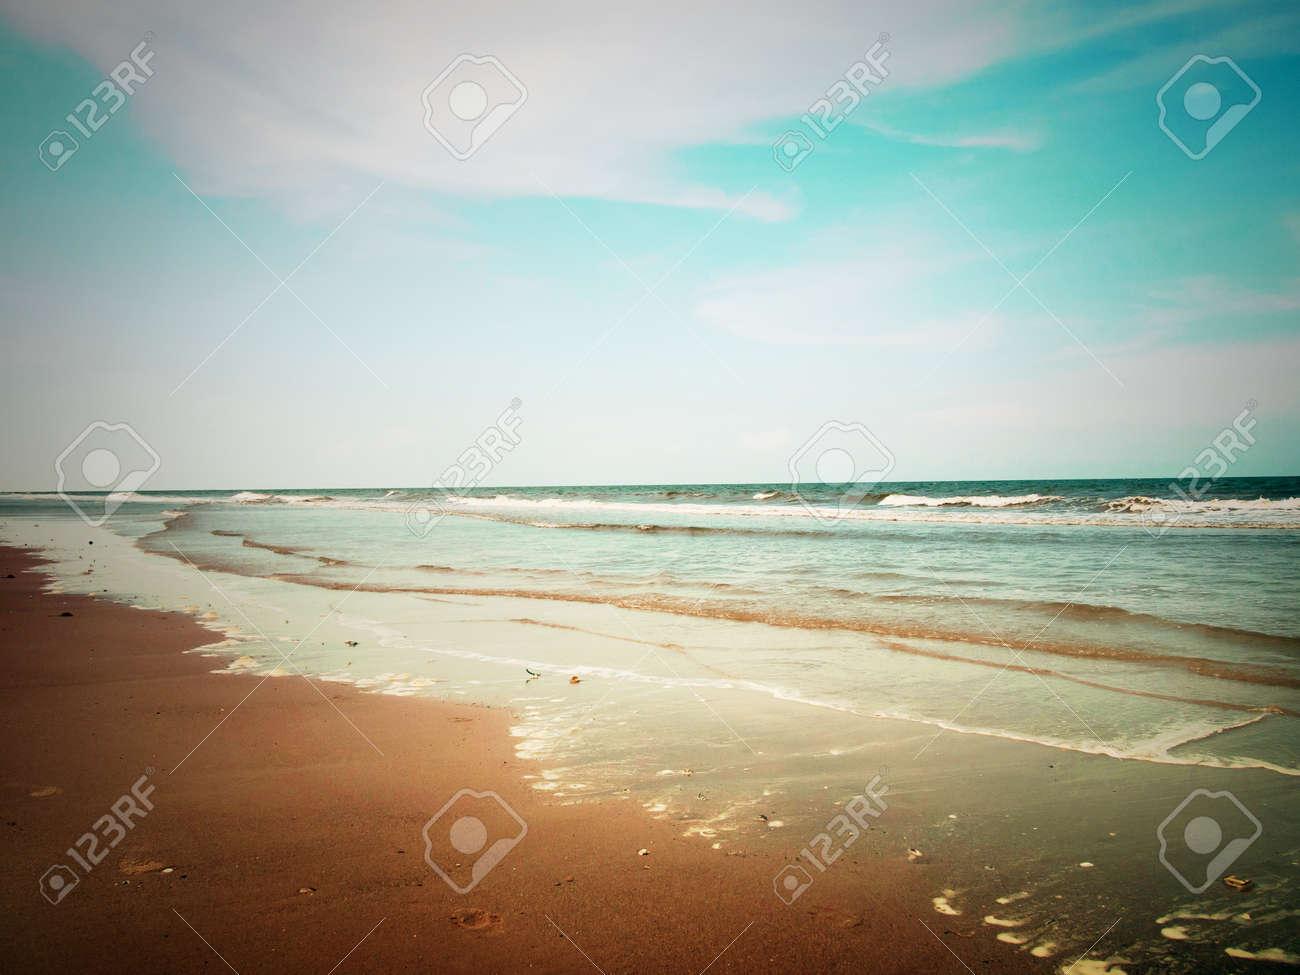 beach and cloudy sky, retro style Stock Photo - 13357866